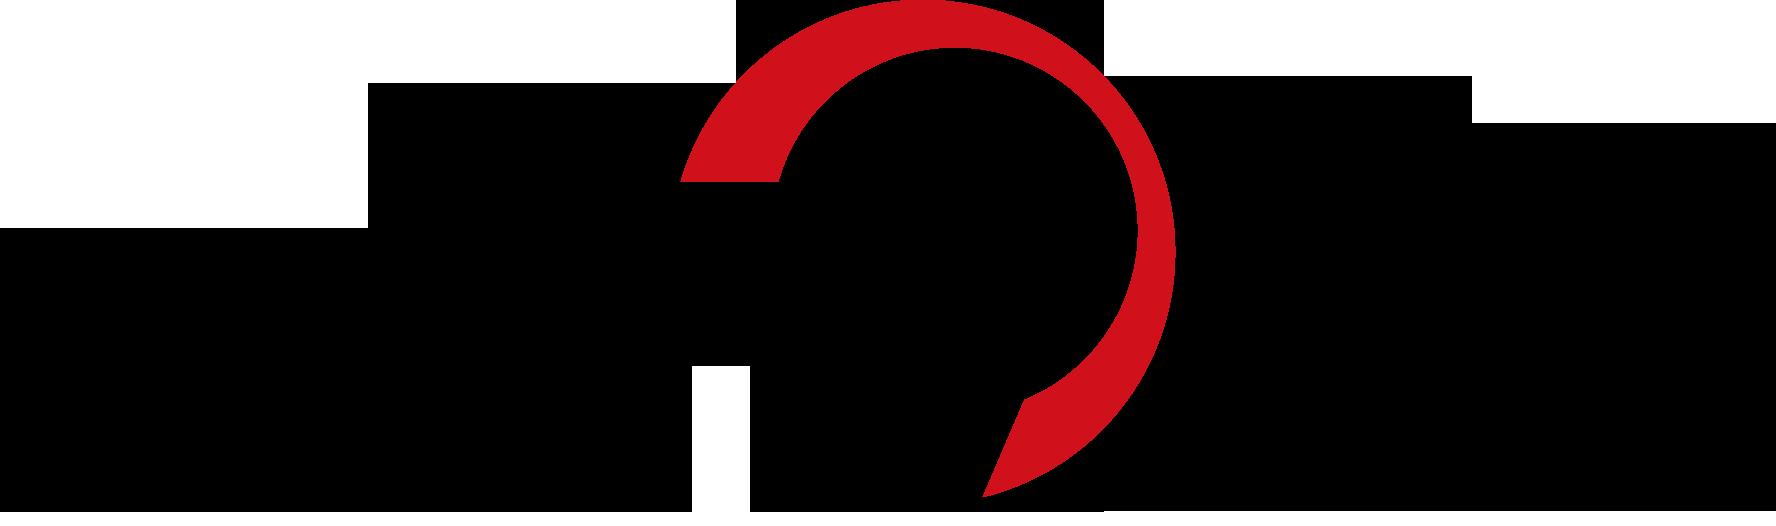 央视网logo-1.png